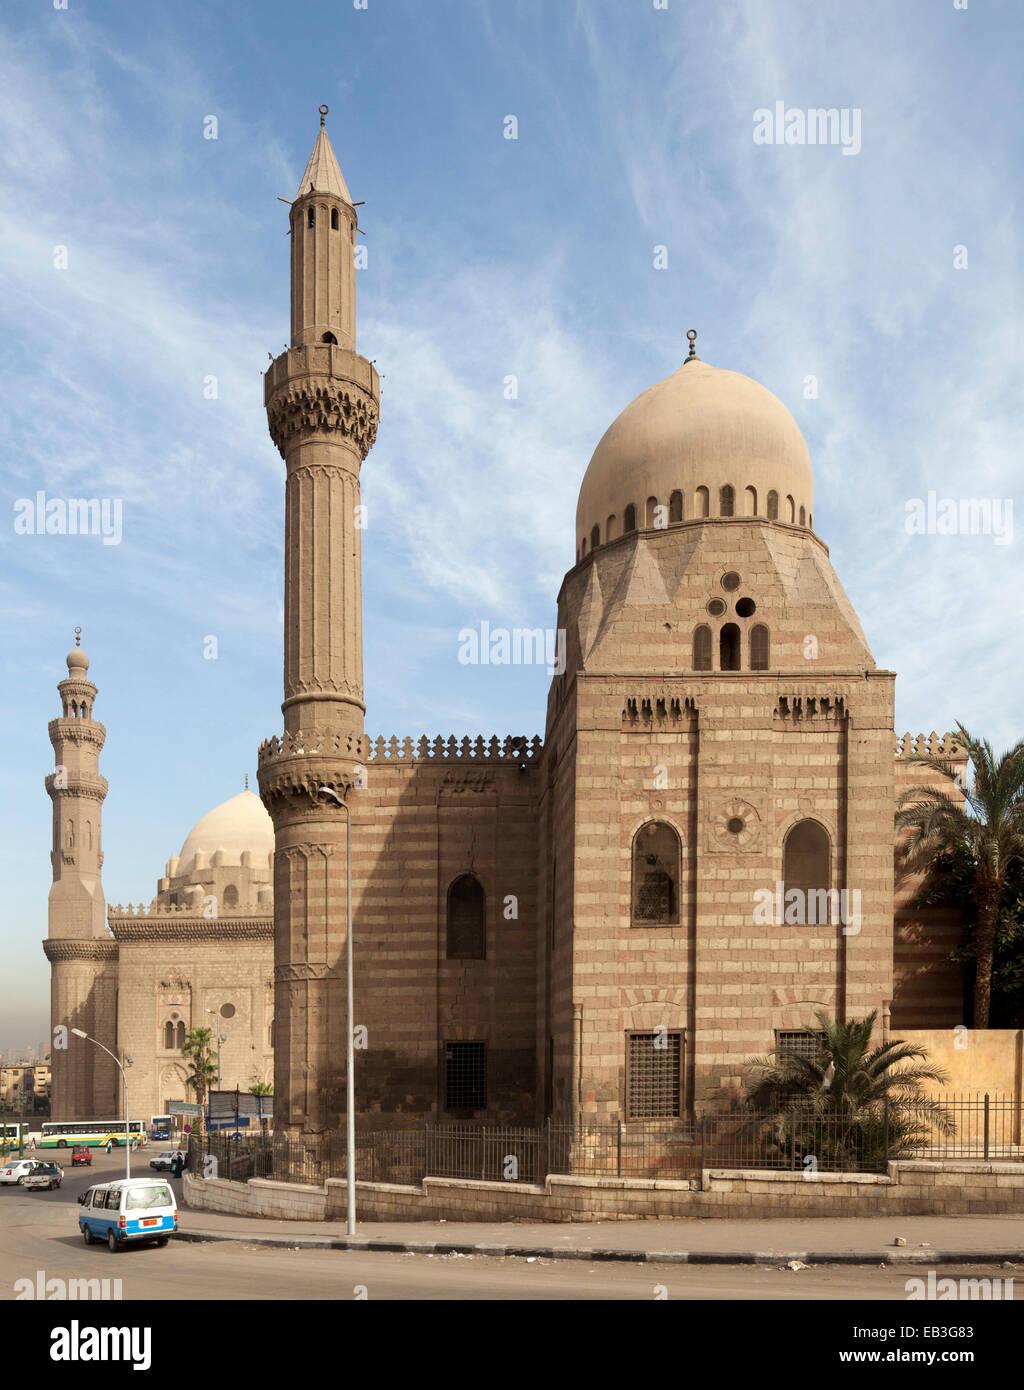 Masjid al-Mahmudiyya, Cairo, Egypt - Stock Image